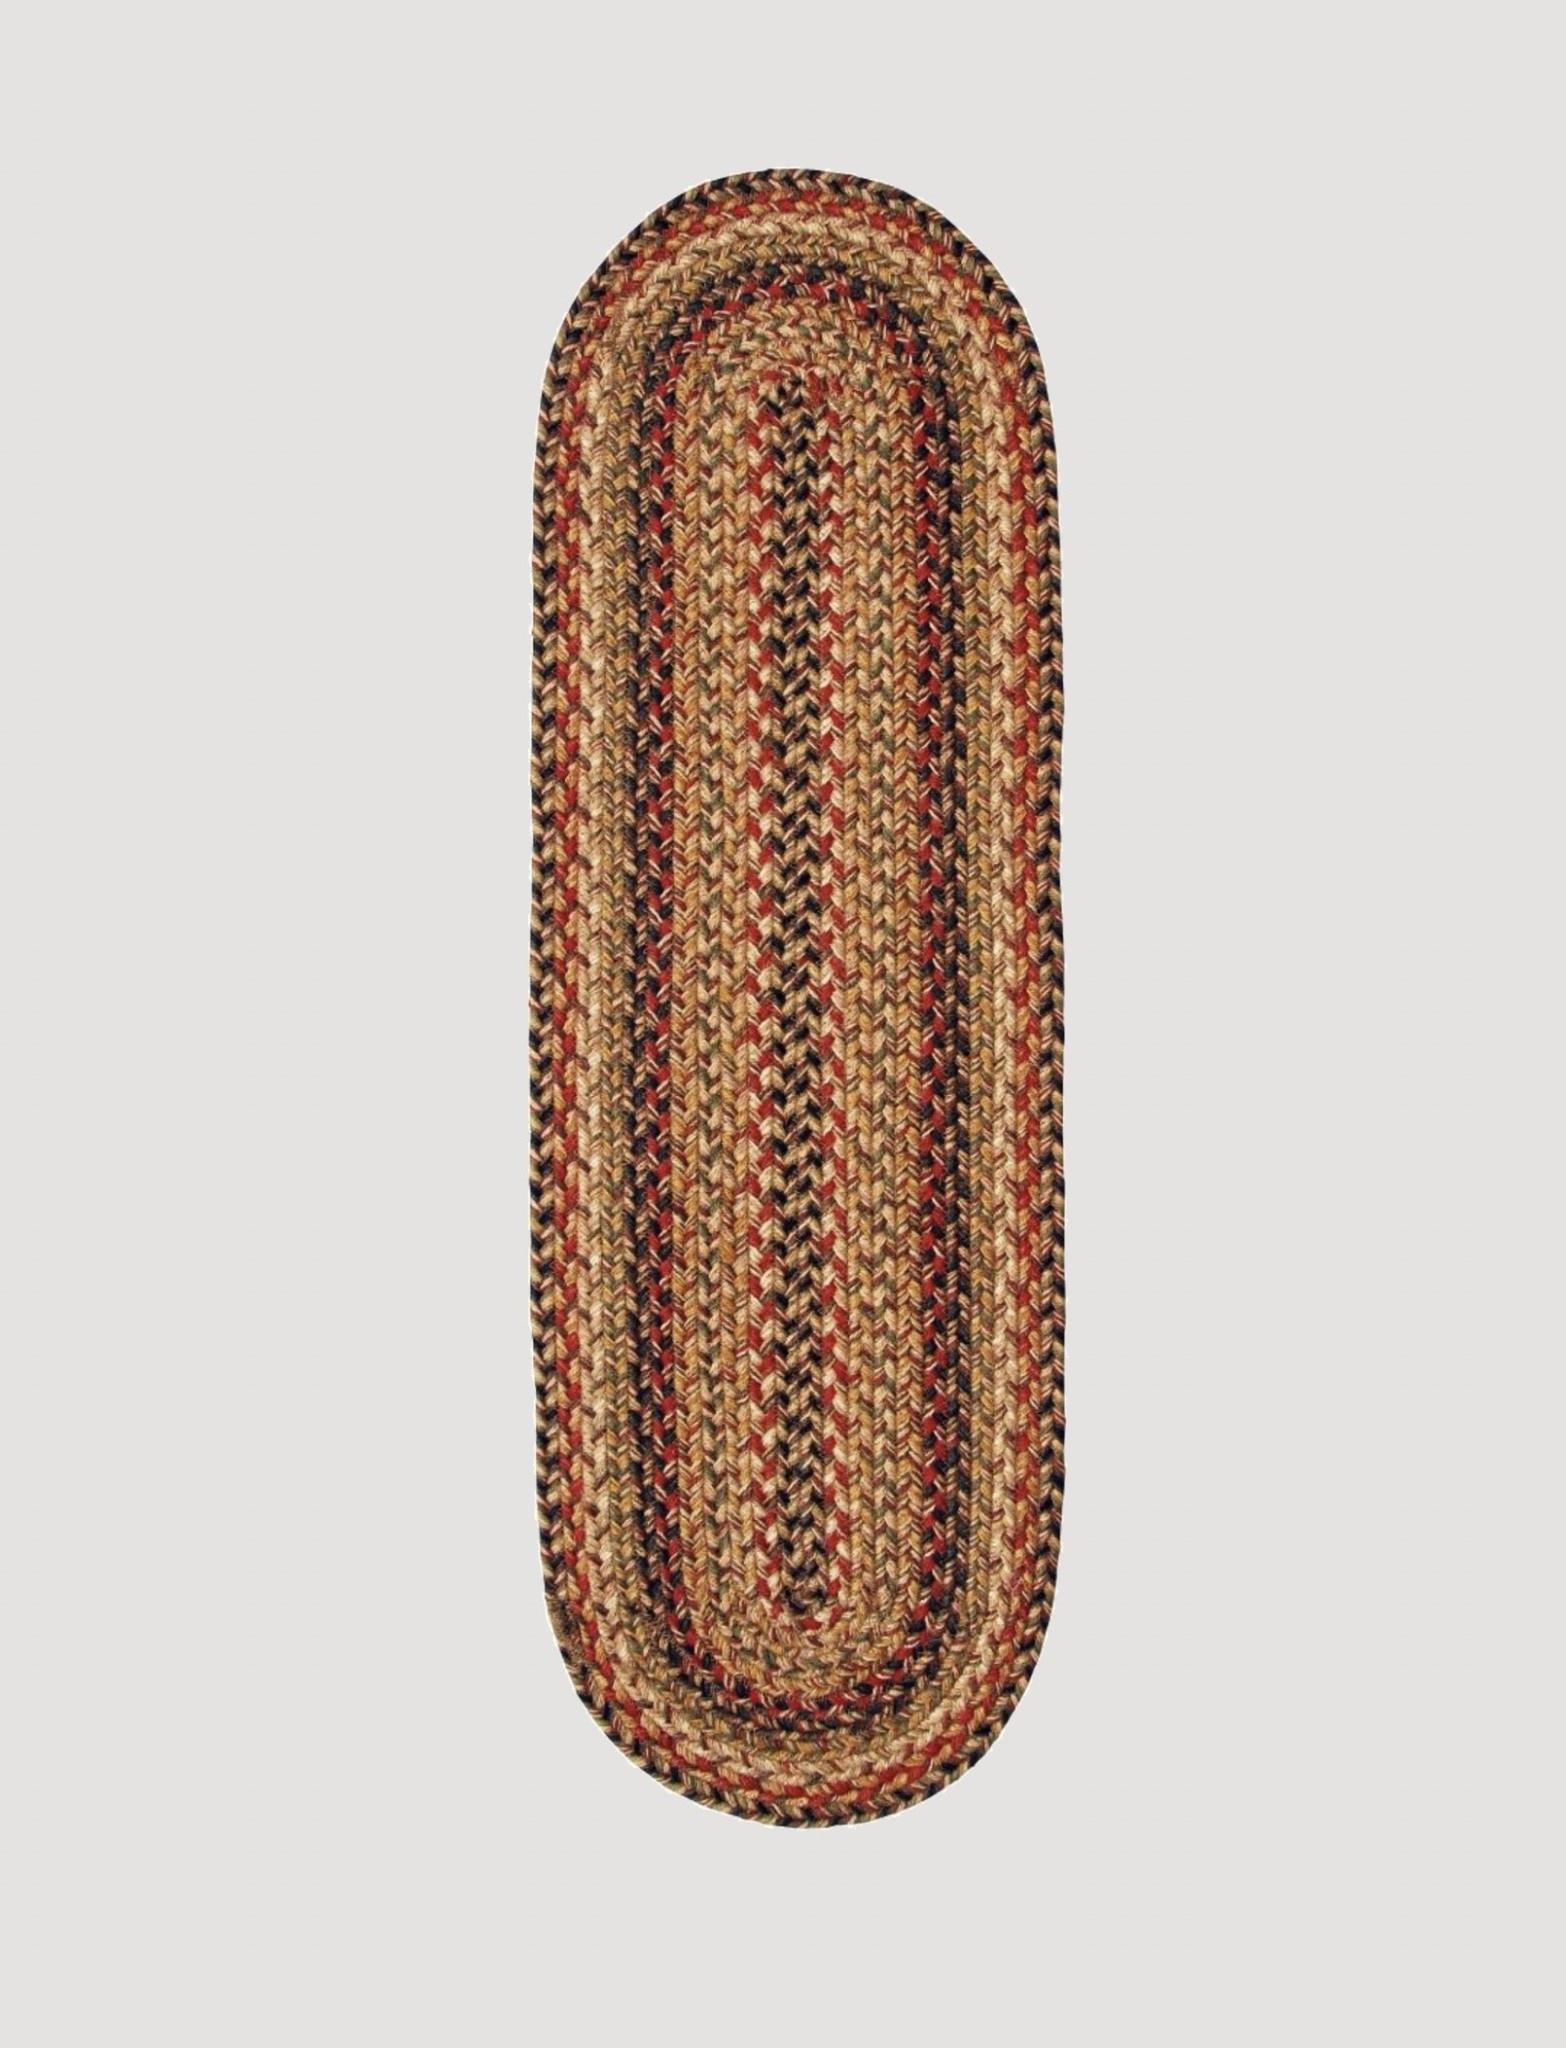 Kingston Jute Braided TableTop Accessories